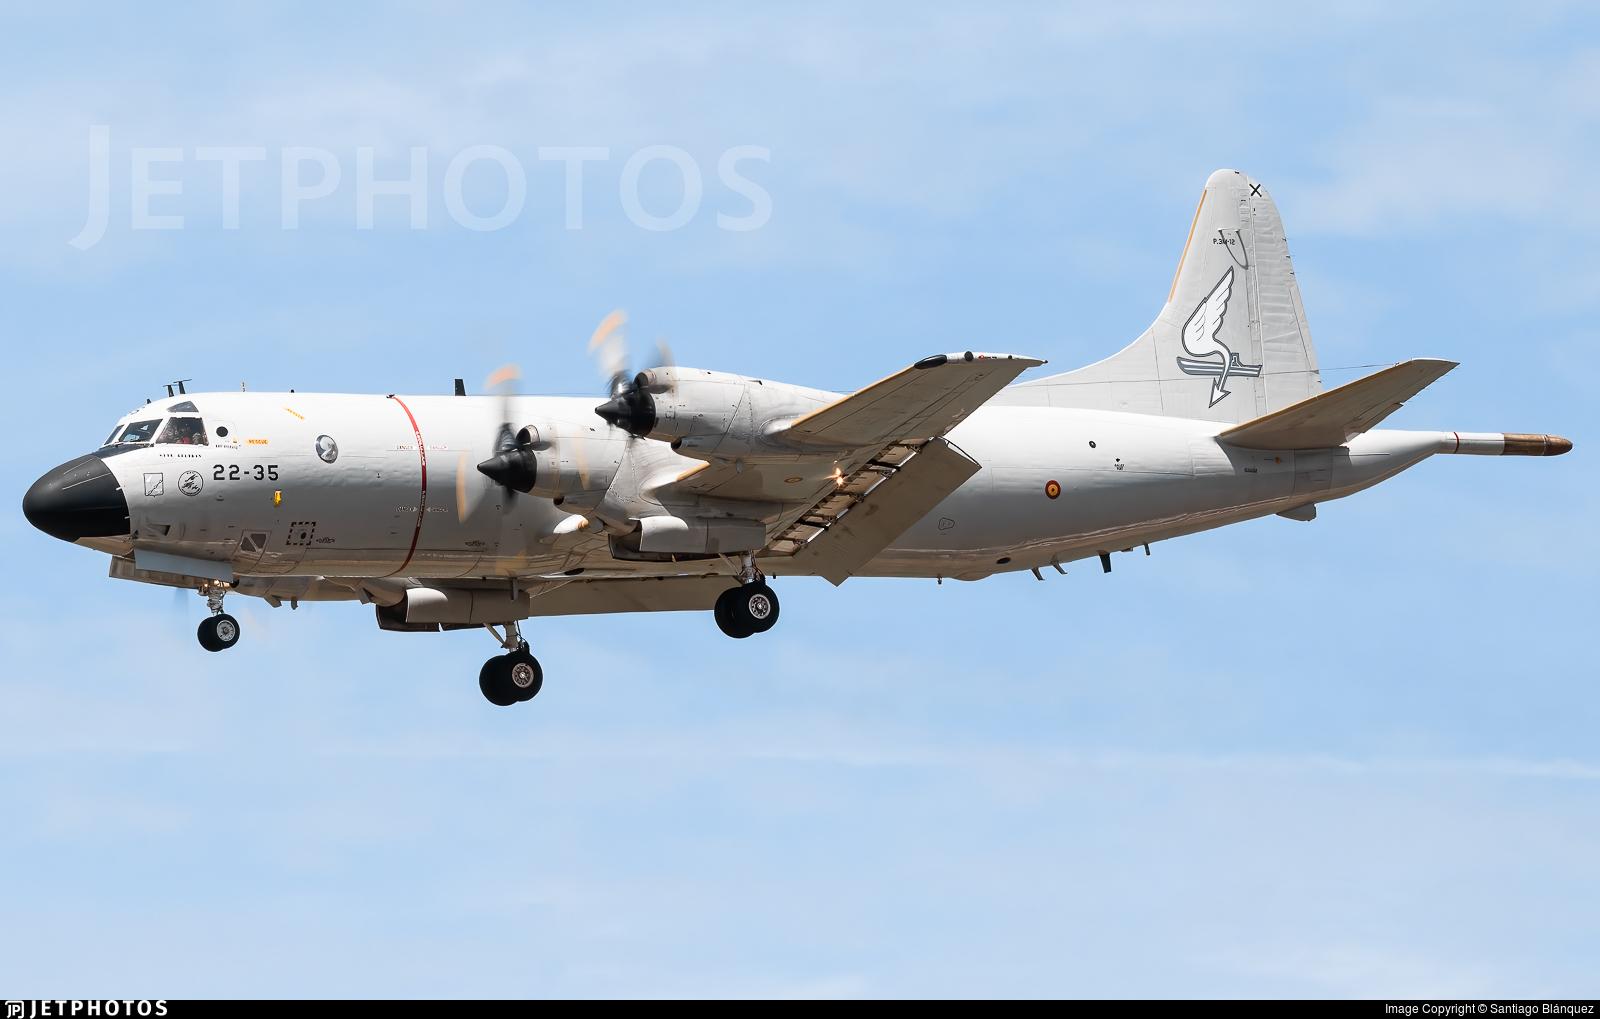 P.3M-12 - Lockheed P-3M Orion - Spain - Air Force